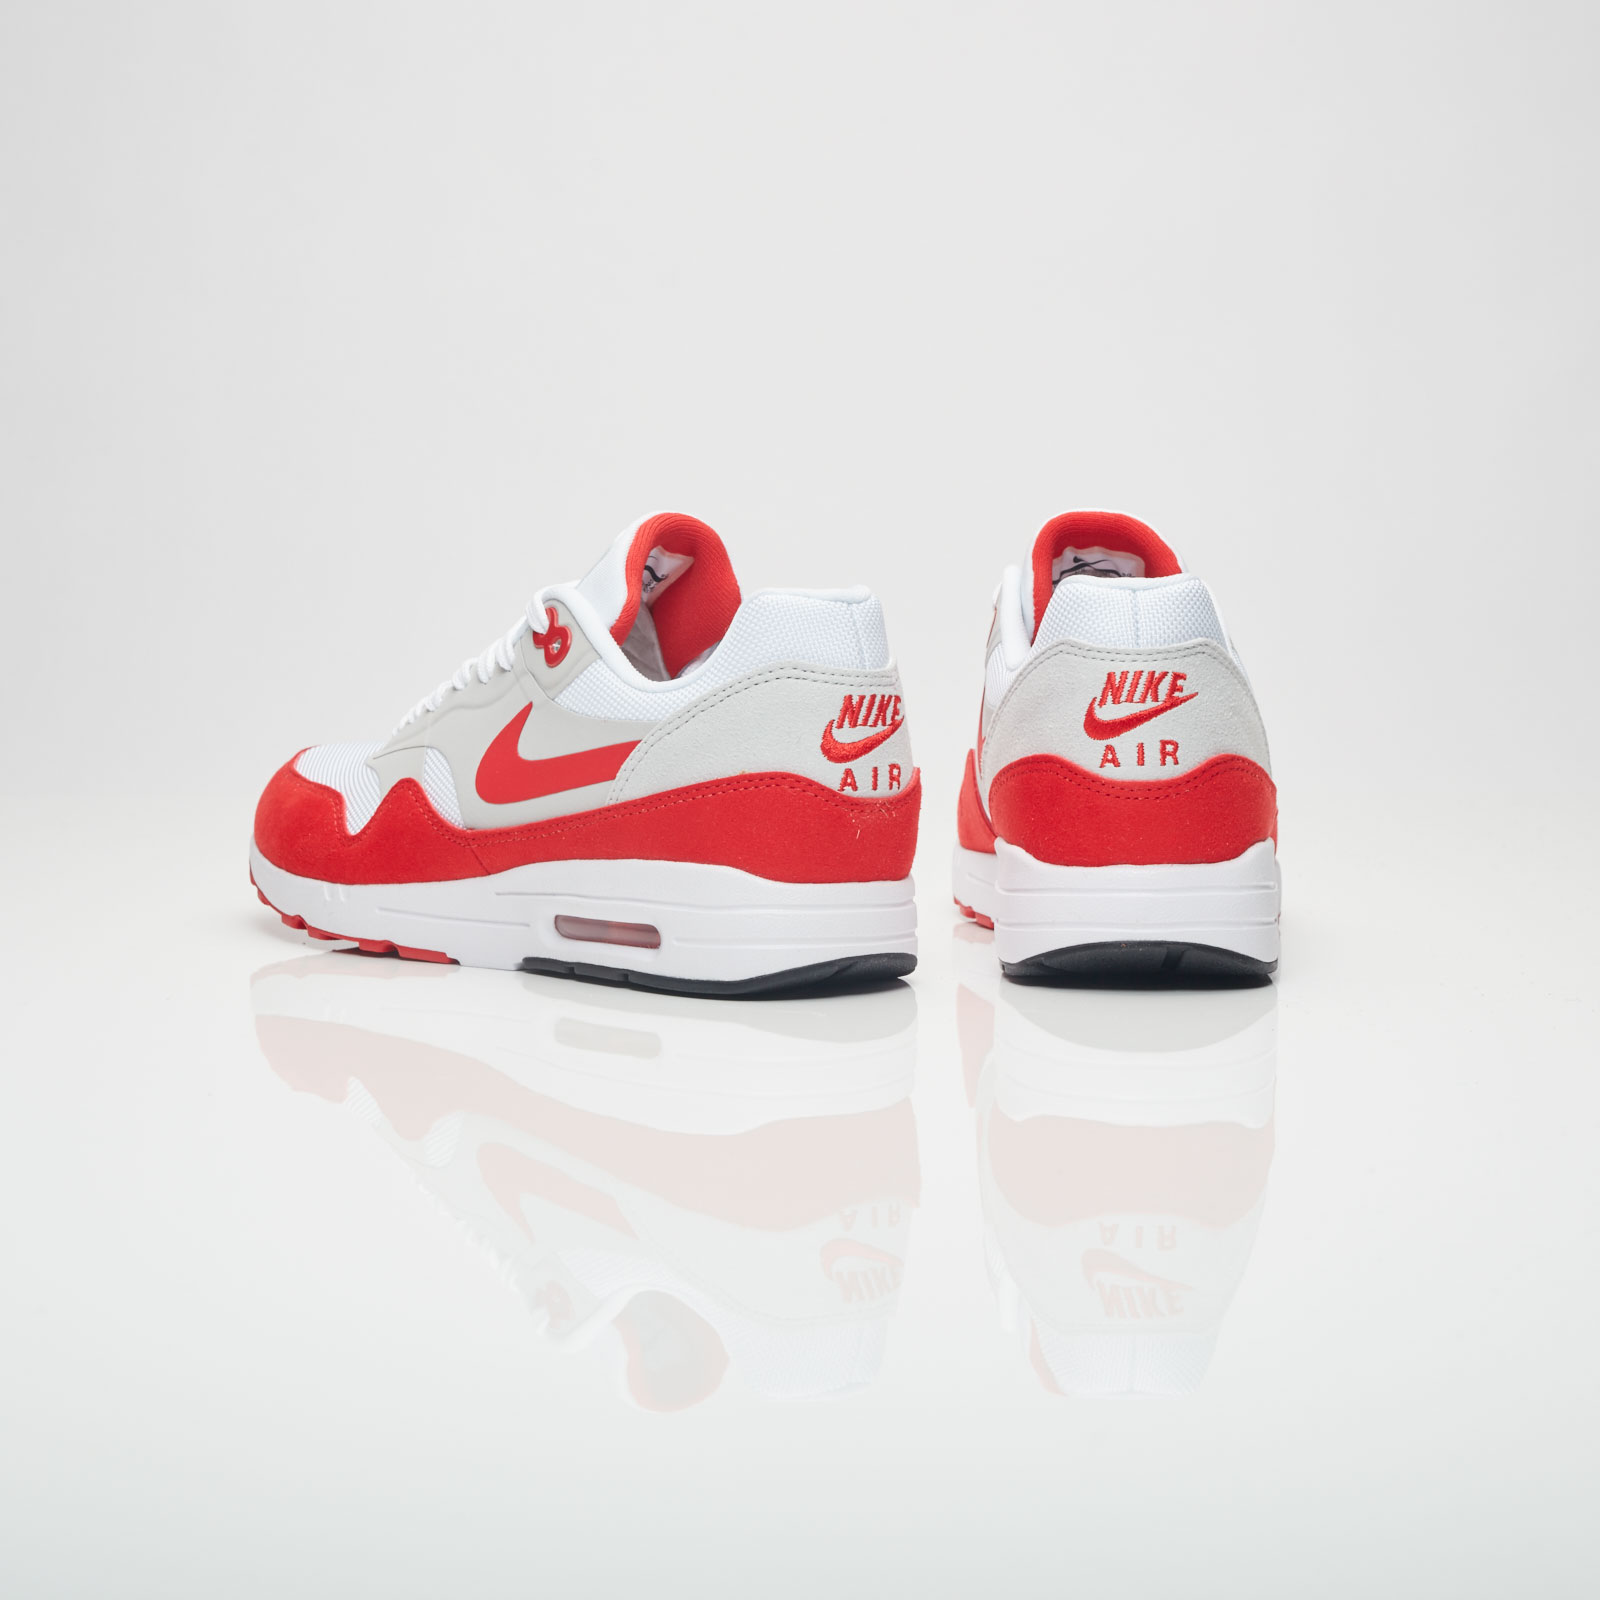 ca3707ecd0 Nike Wmns Air Max 1 Ultra 2.0 Le - 908489-101 - Sneakersnstuff | sneakers &  streetwear online since 1999